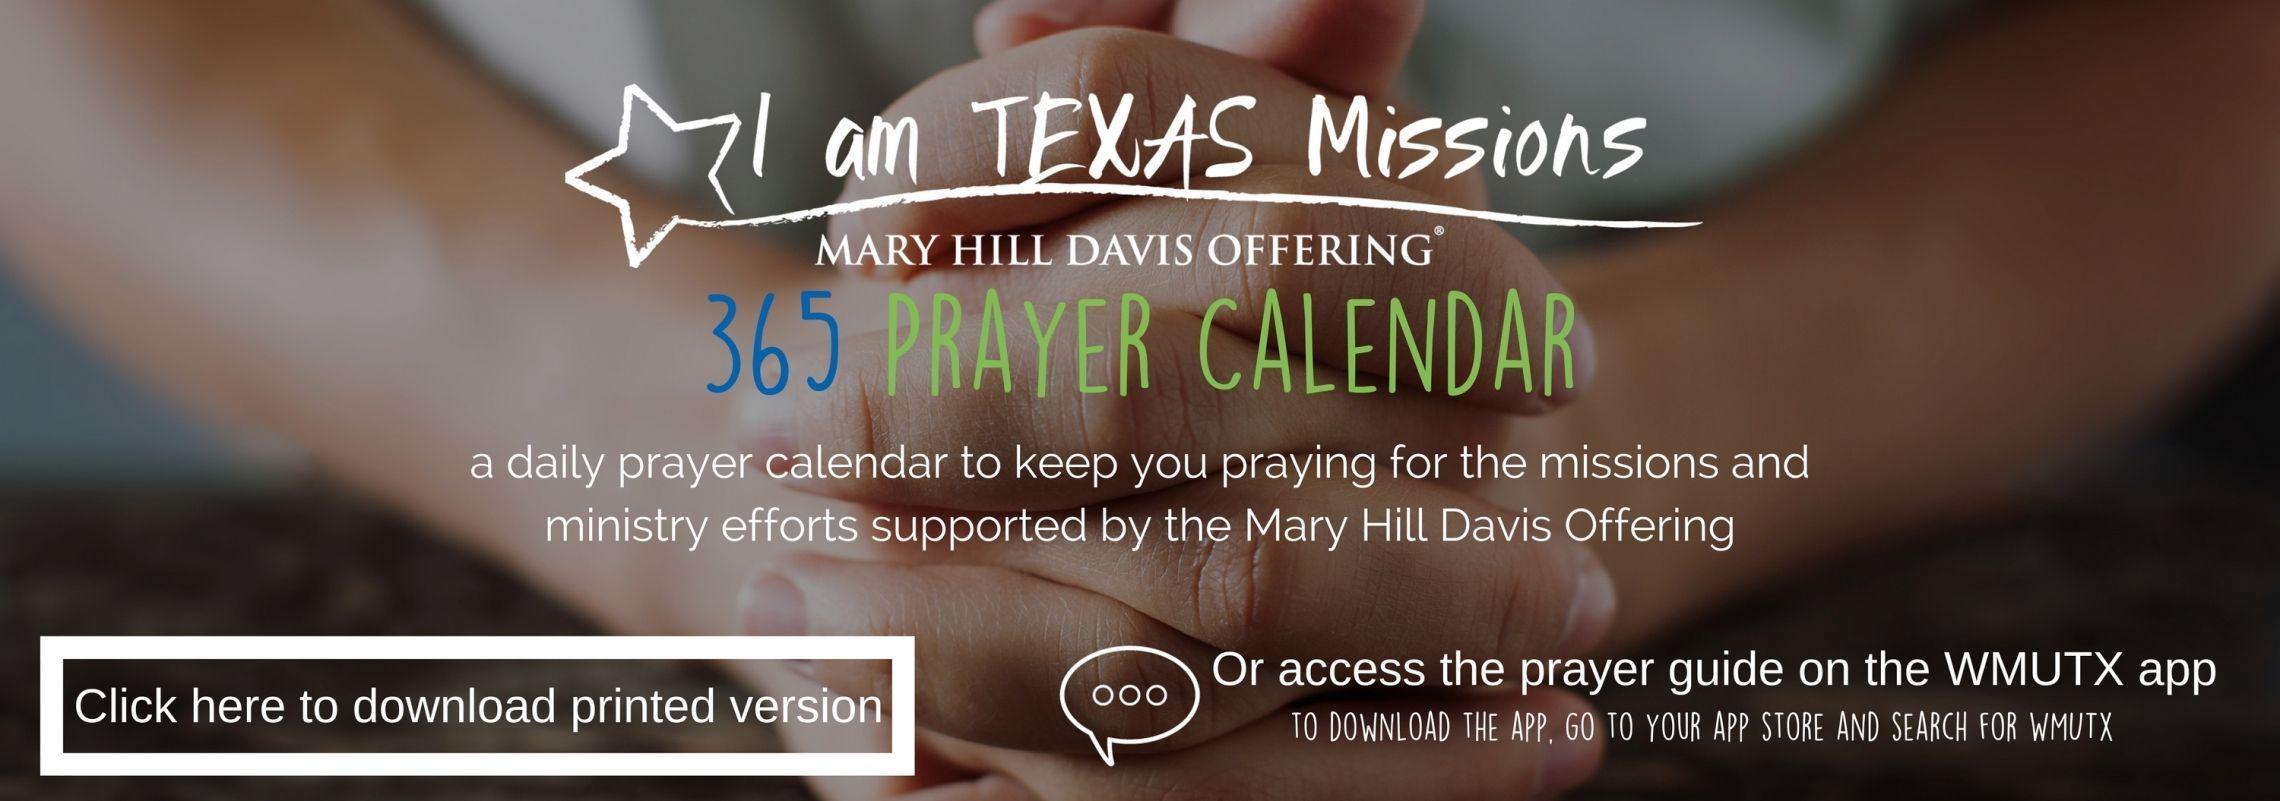 Mary hill davis offering clipart 6 » Clipart Portal.